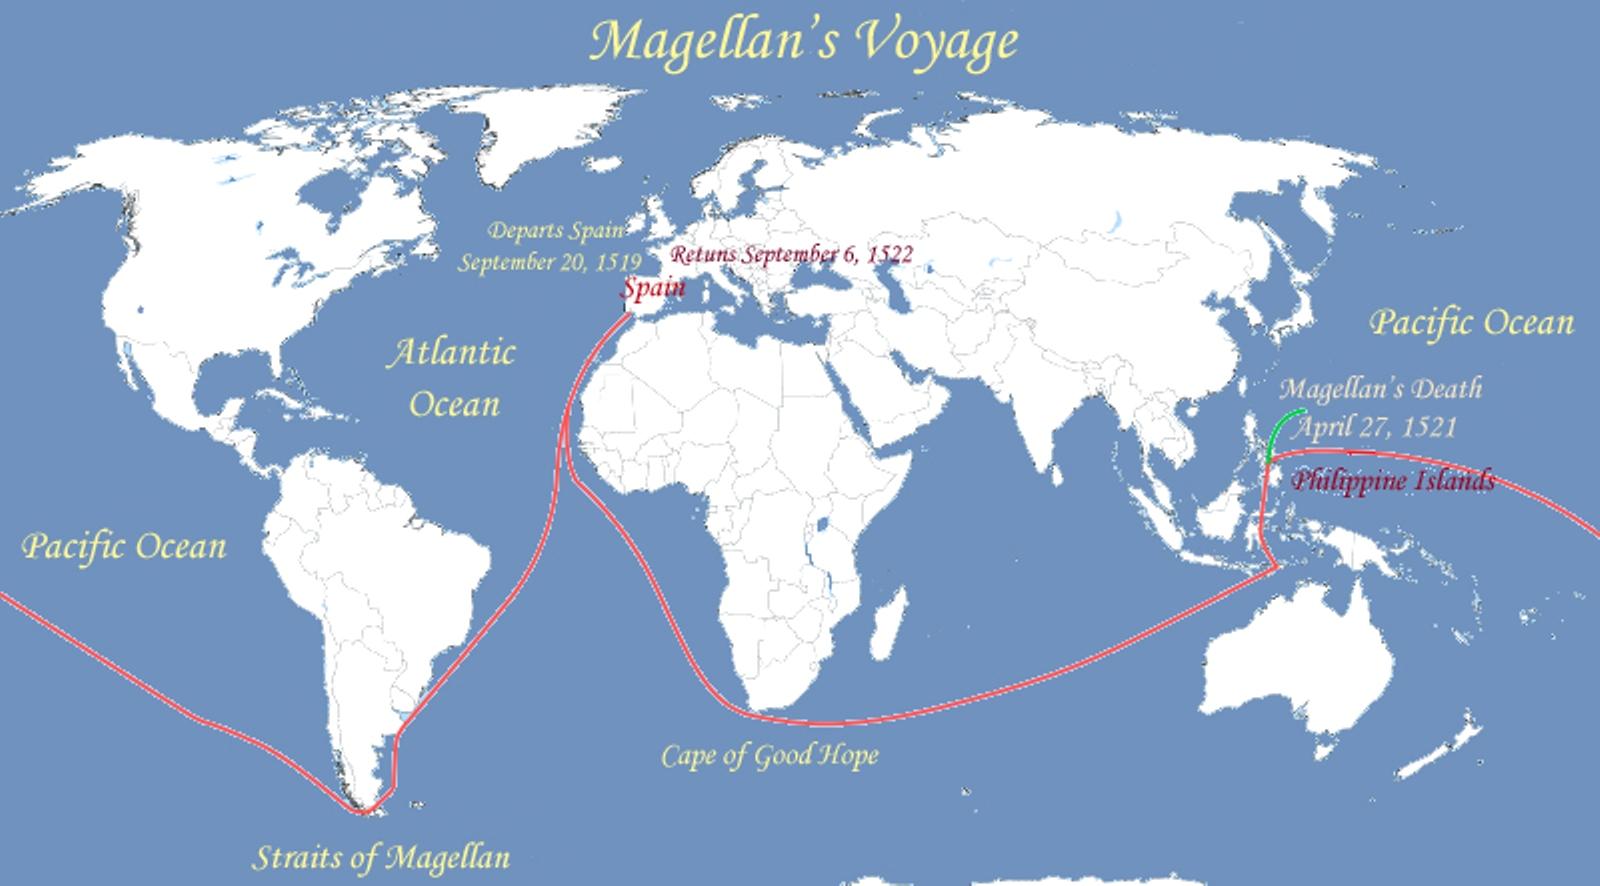 a biography of ferdinand magellan an explorer Play, streaming, watch and download ferdinand magellan - explorer | mini bio | bio video (02:11) , you can convert to mp4, 3gp, m4a for free watch a short biography.